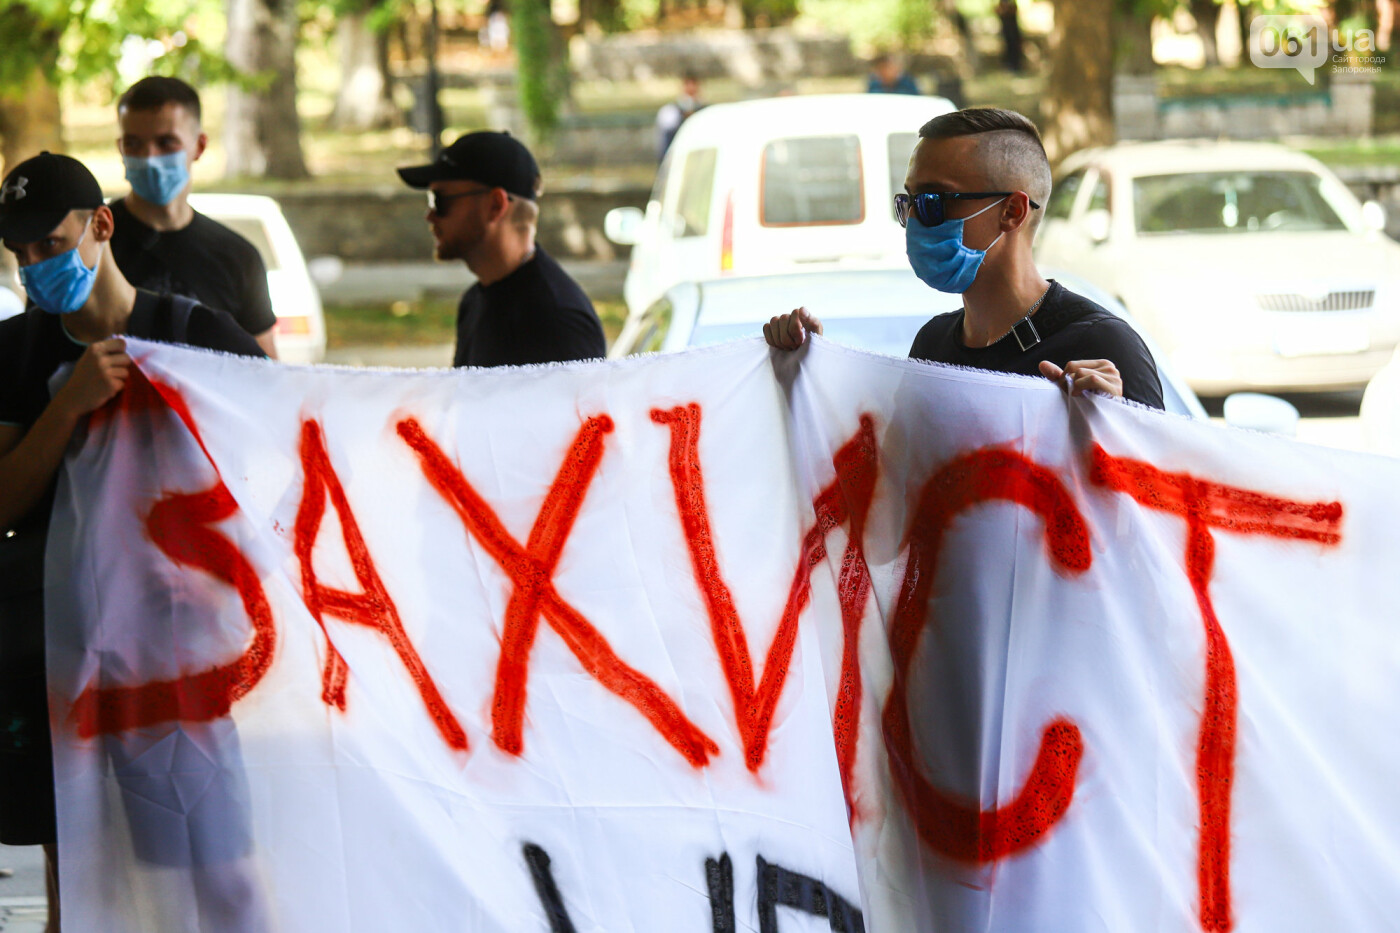 """Захист країни - не злочин"": в Запорожье патриоты провели митинг у стен нацполиции, - ФОТОРЕПОРТАЖ , фото-16"